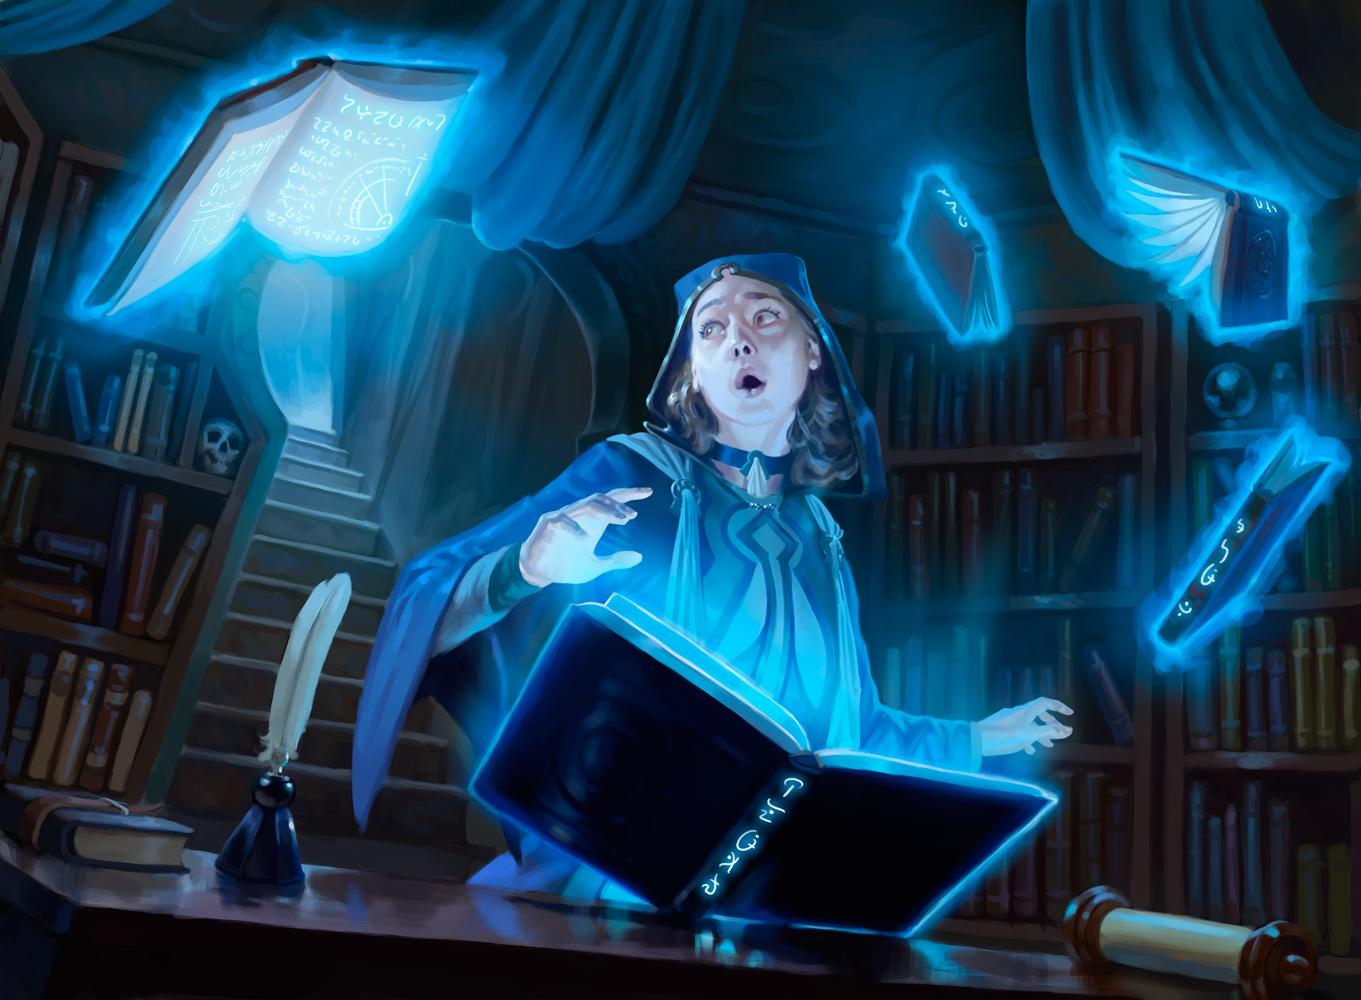 Sorcerer's-apprentice